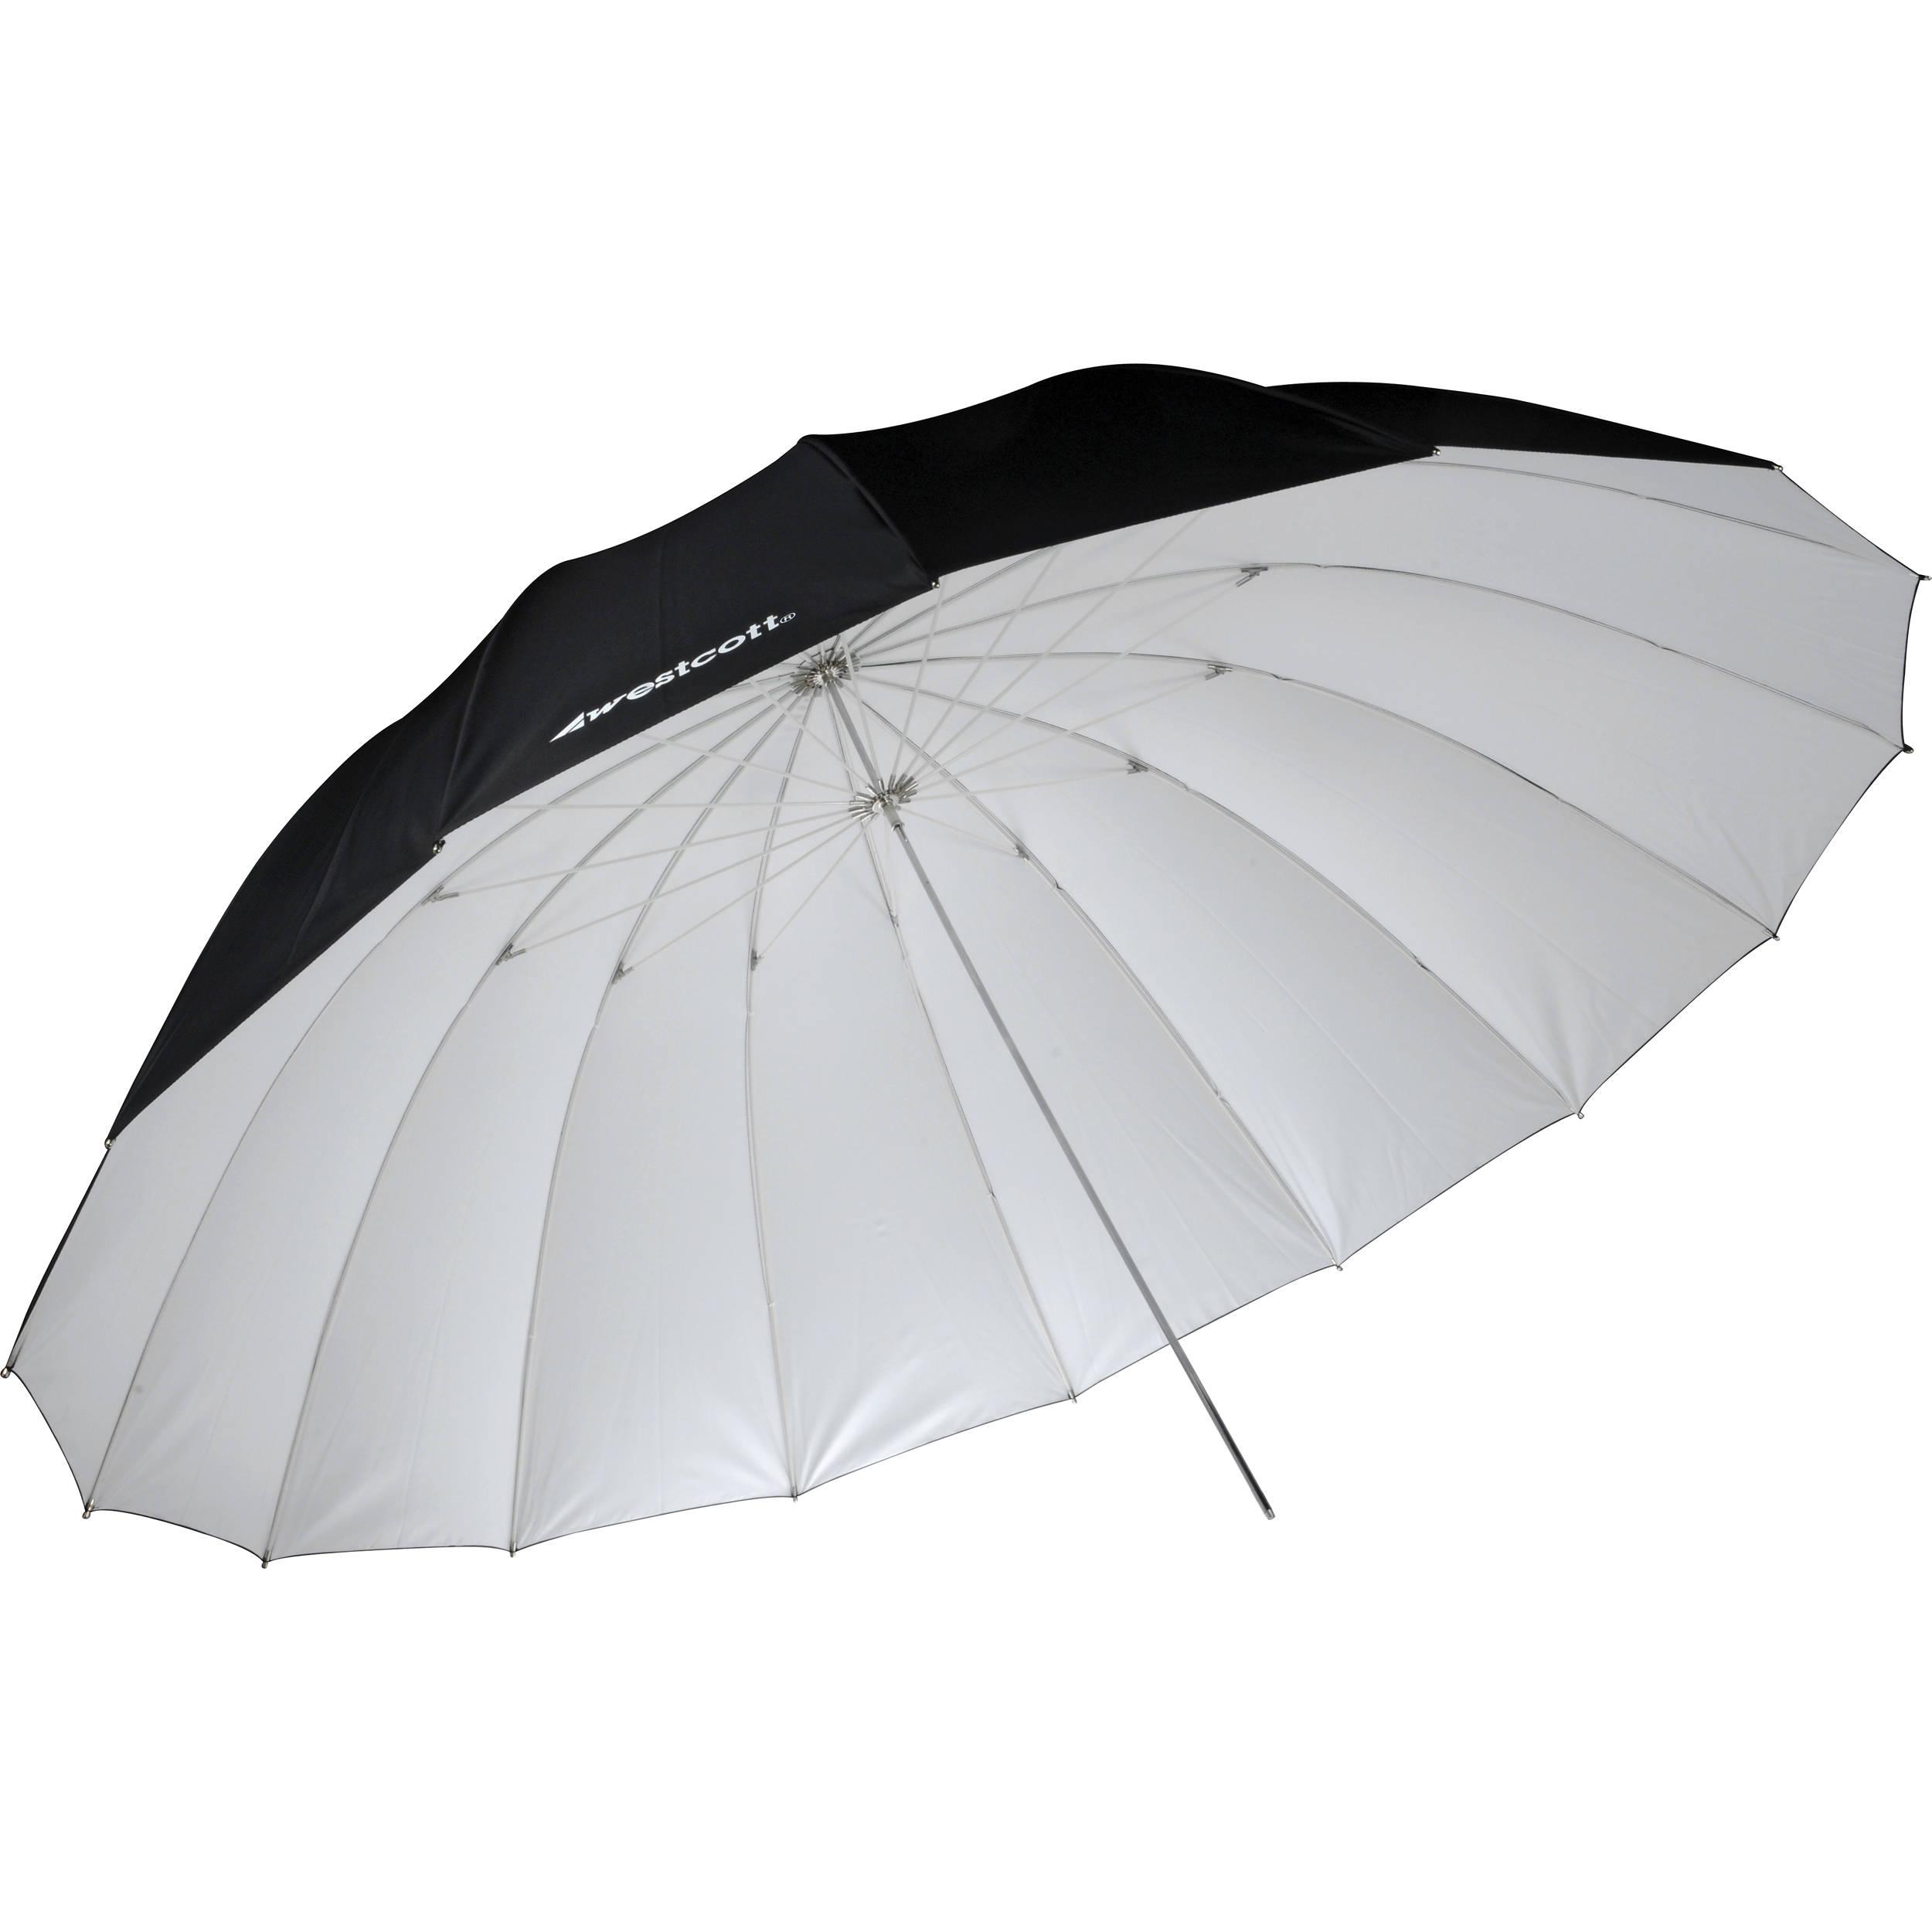 Parabolic Umbrella Vs Softbox: Westcott 7' Parabolic Umbrella (White / Black) 4634 B&H Photo